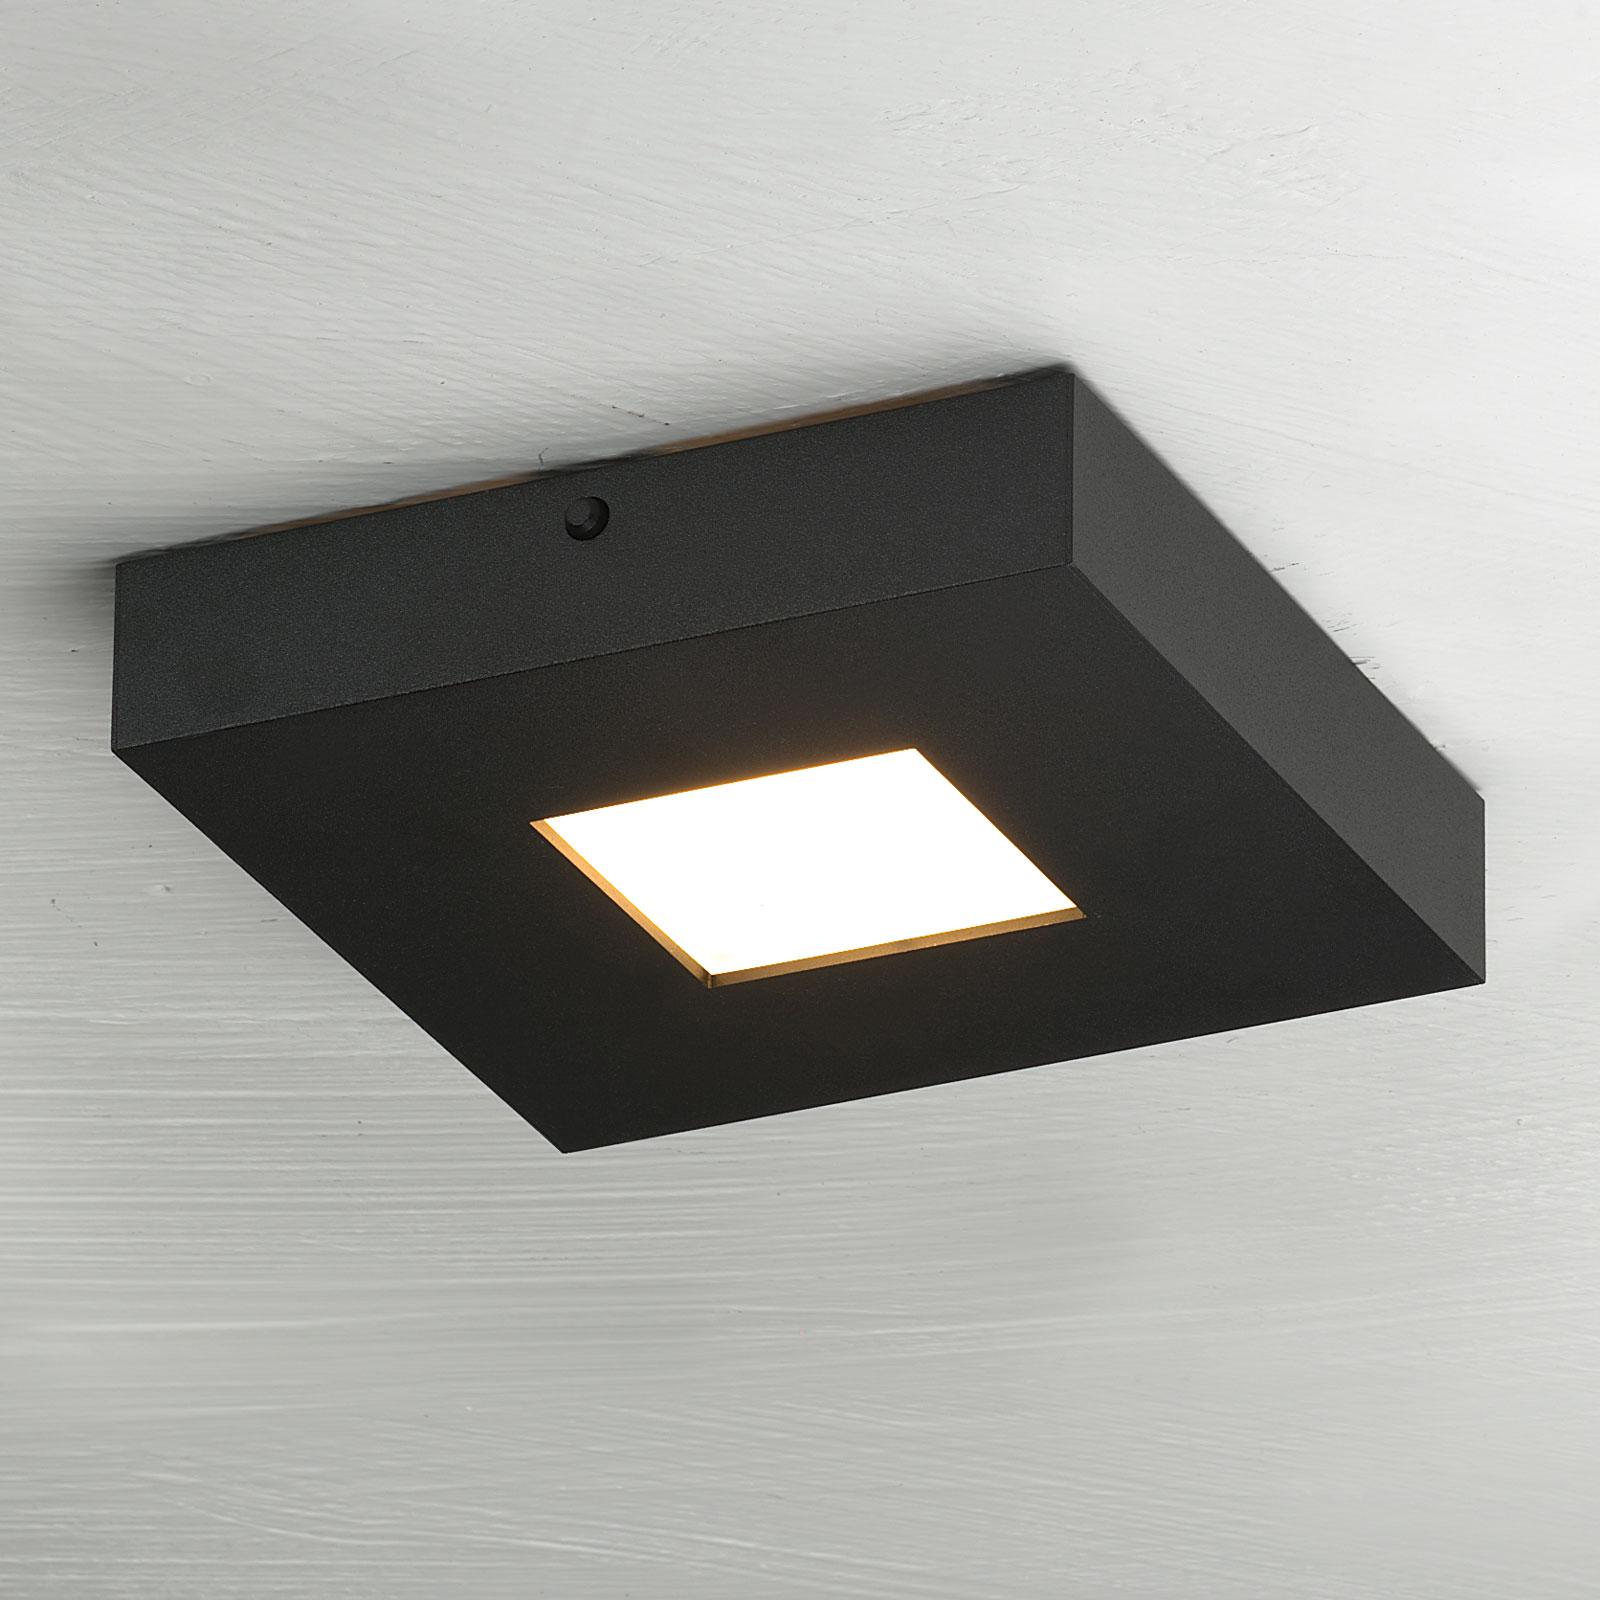 LED-plafondlamp Cubus in zwart